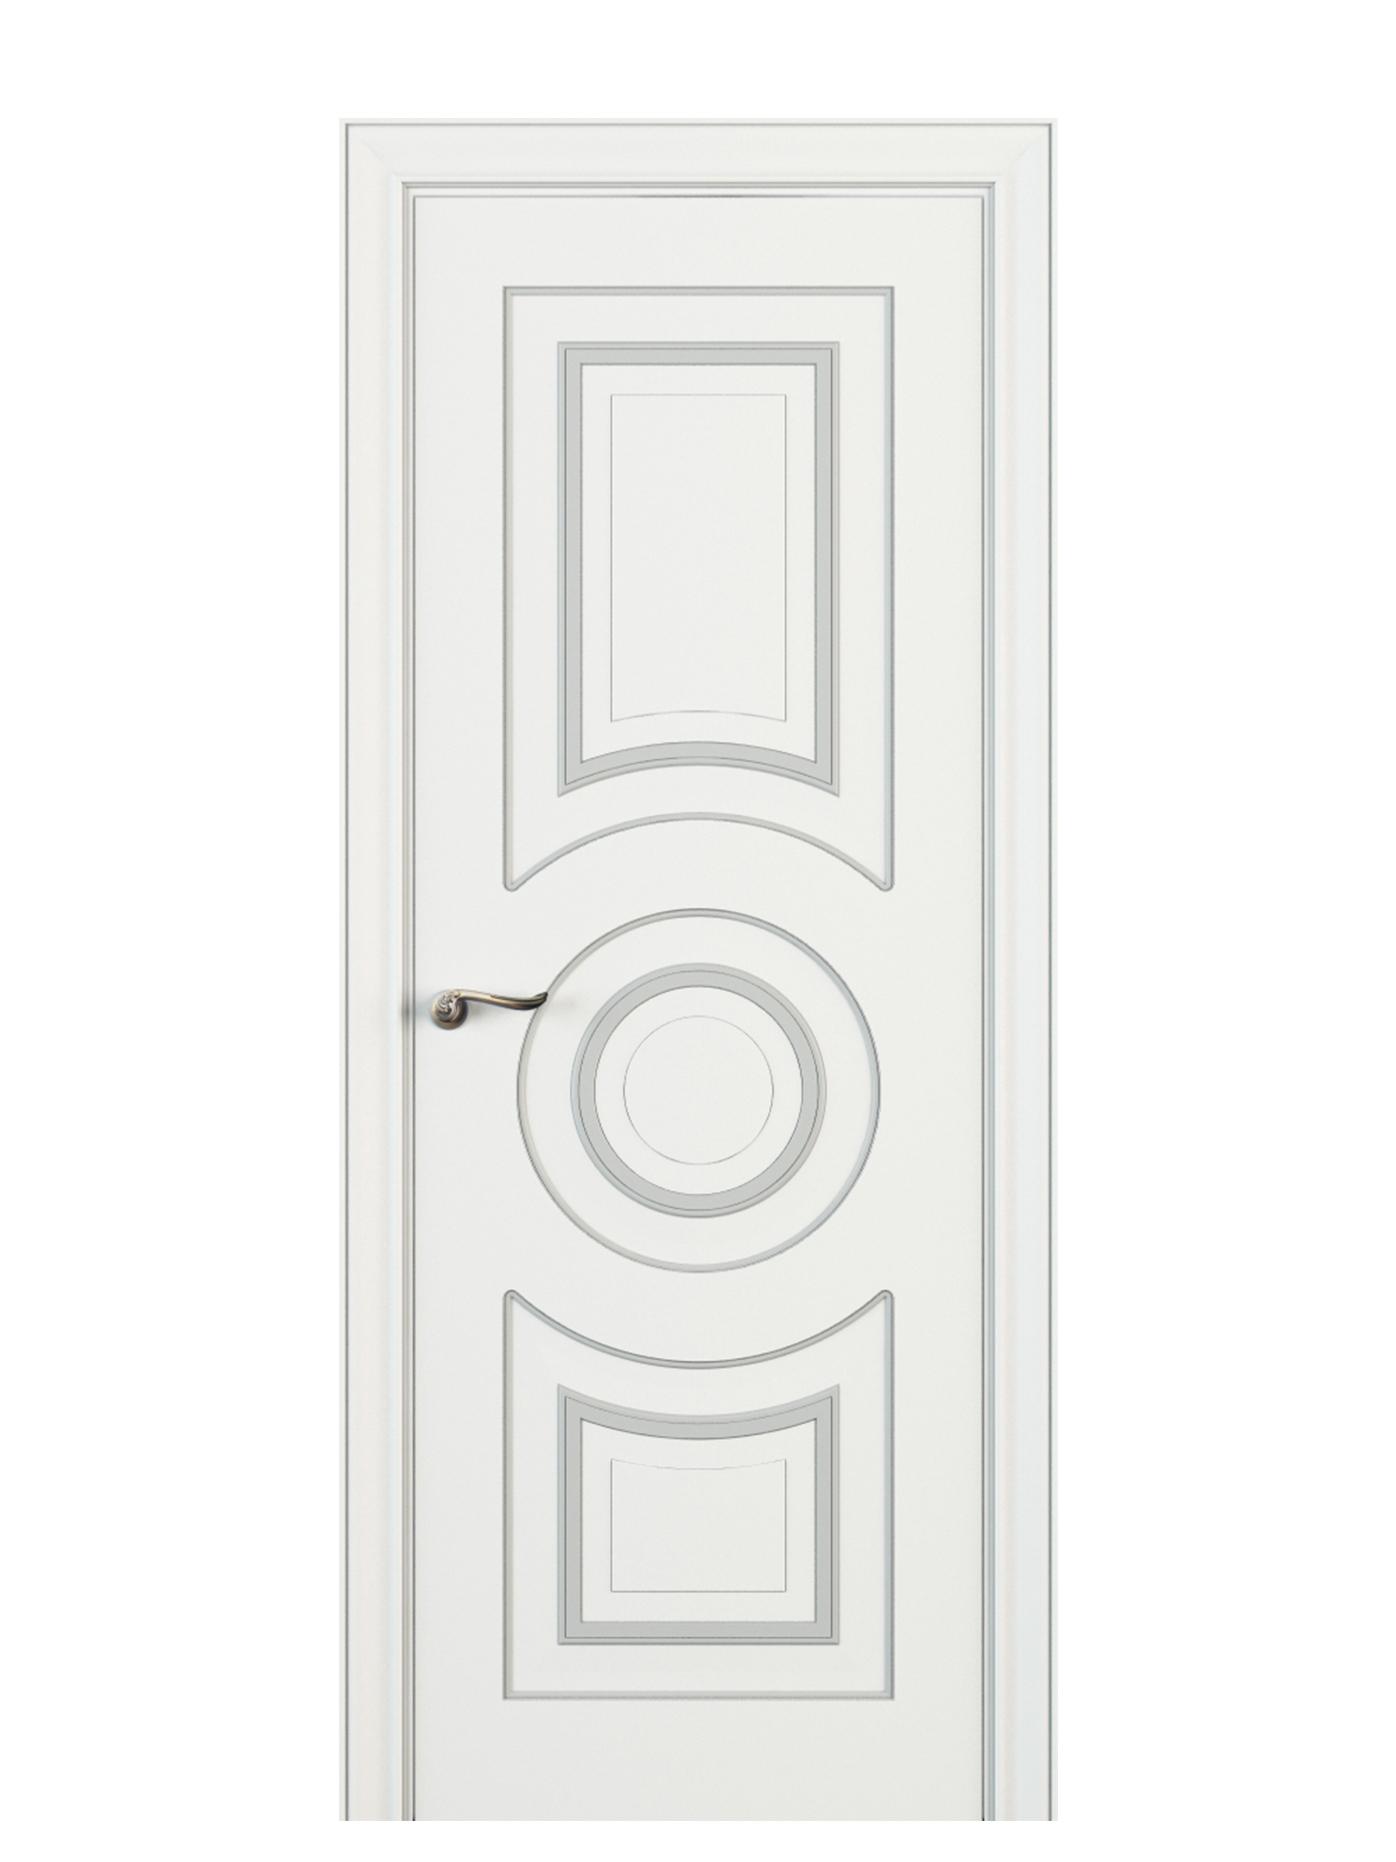 Image Viola Interior Door Italian Enamel White 0